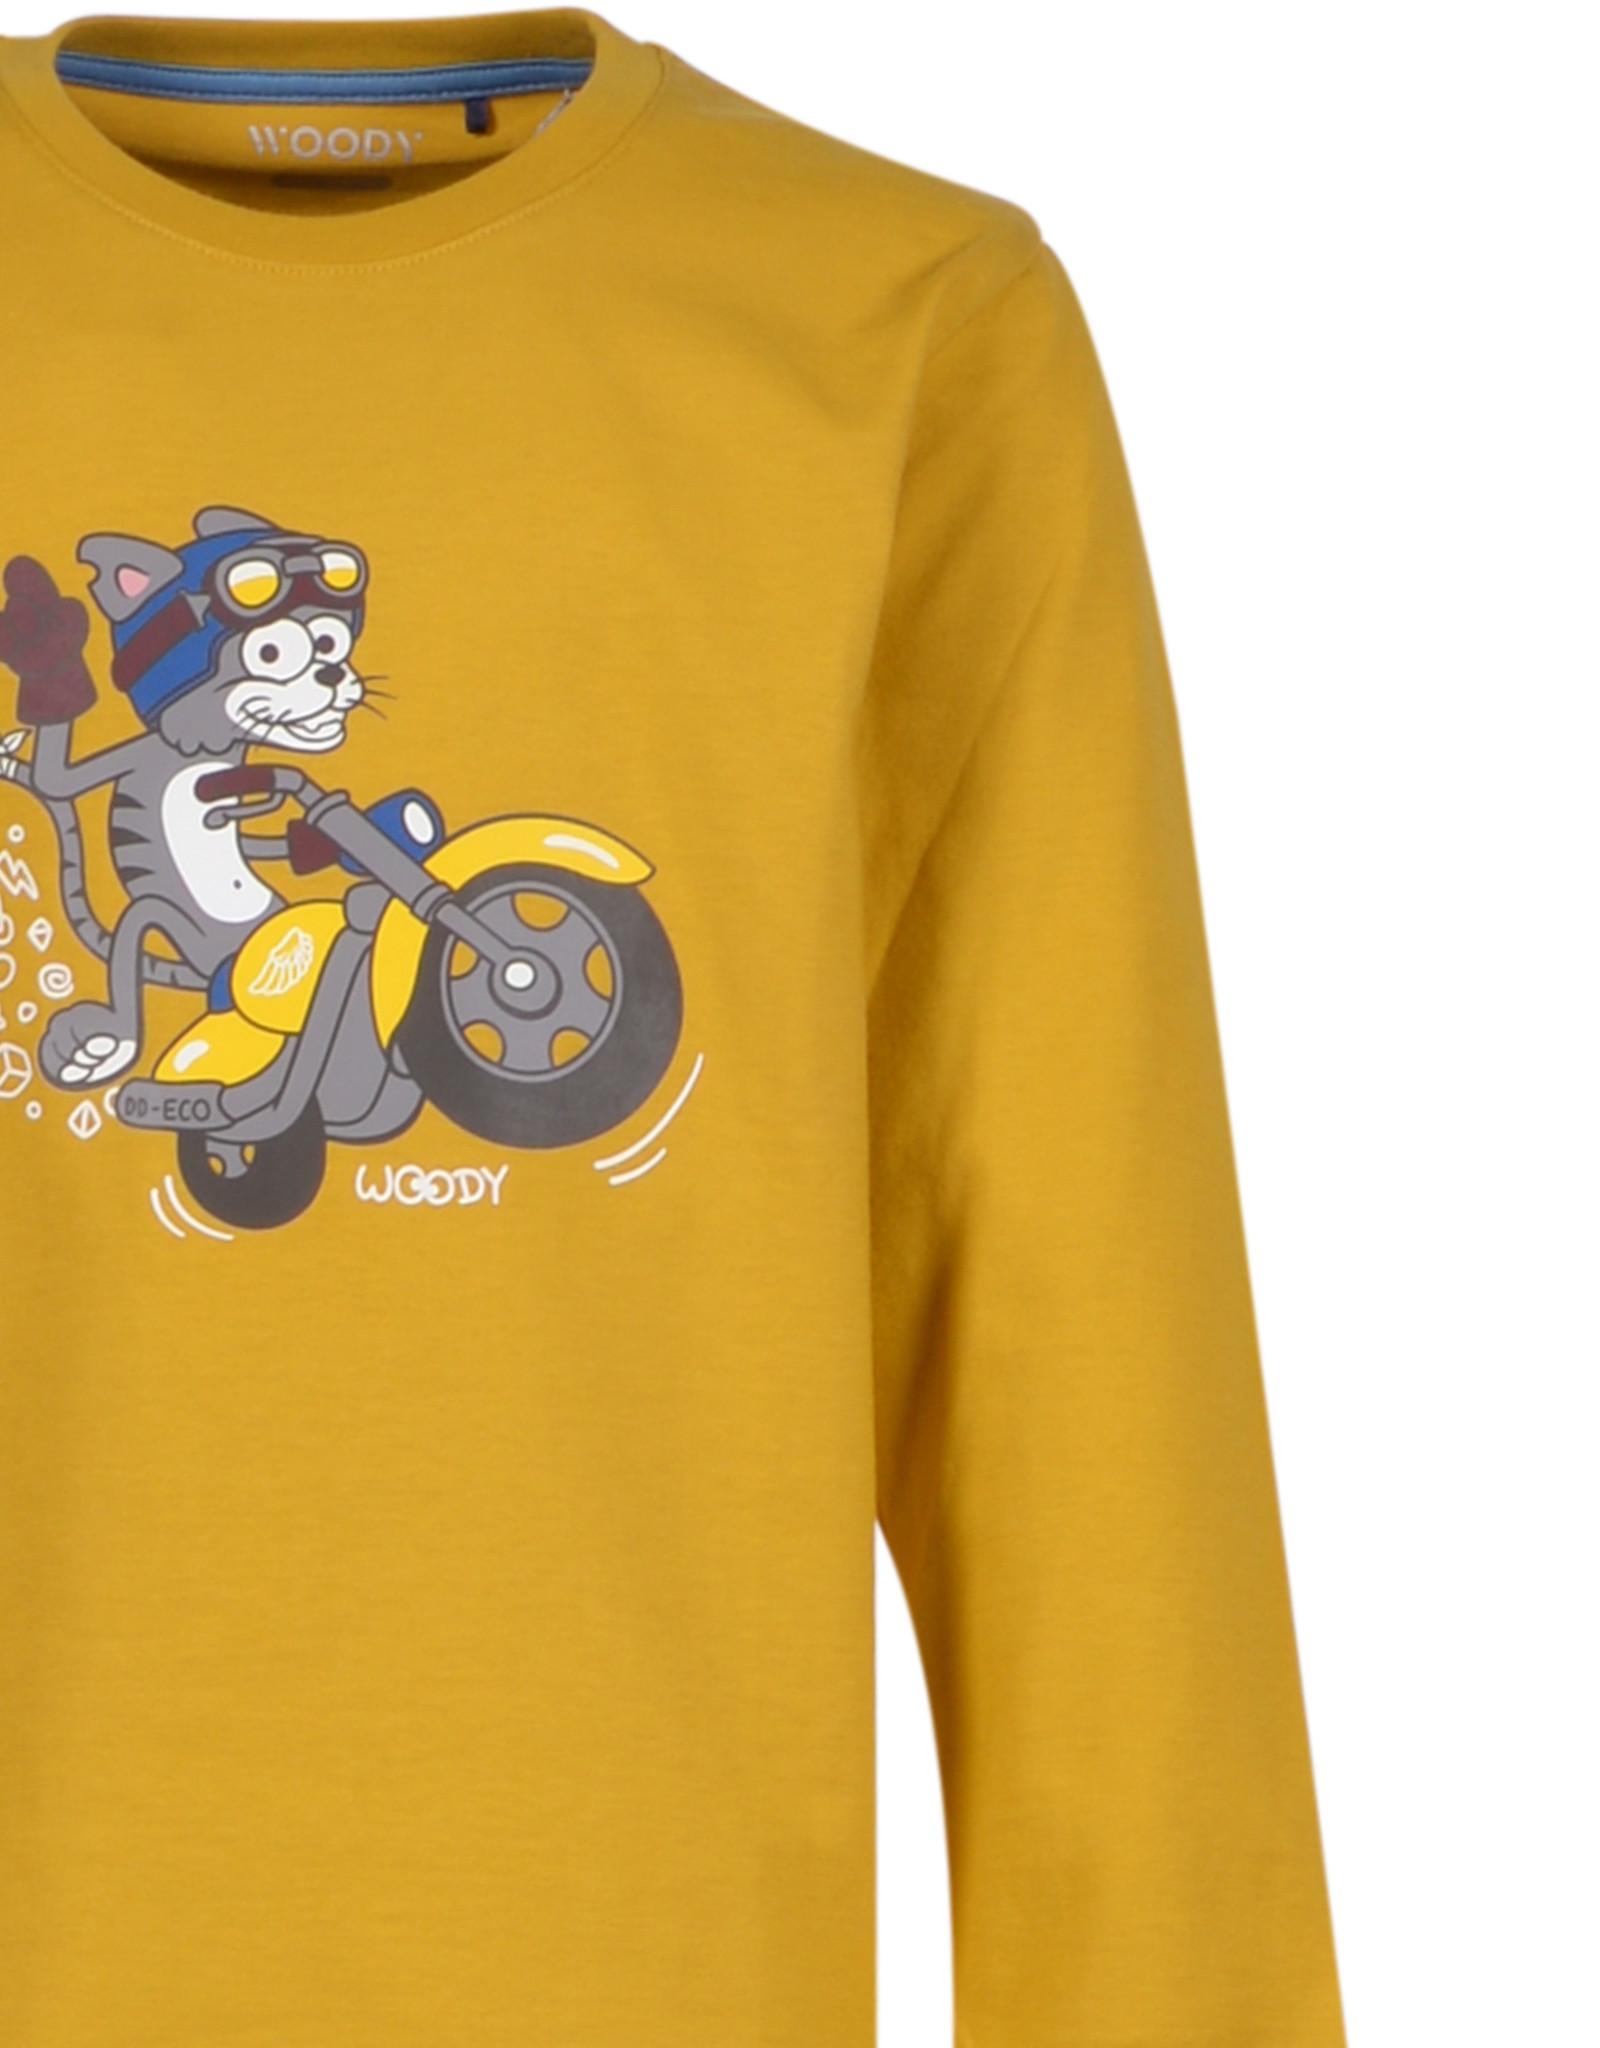 Woody Jongens pyjama, currygeel